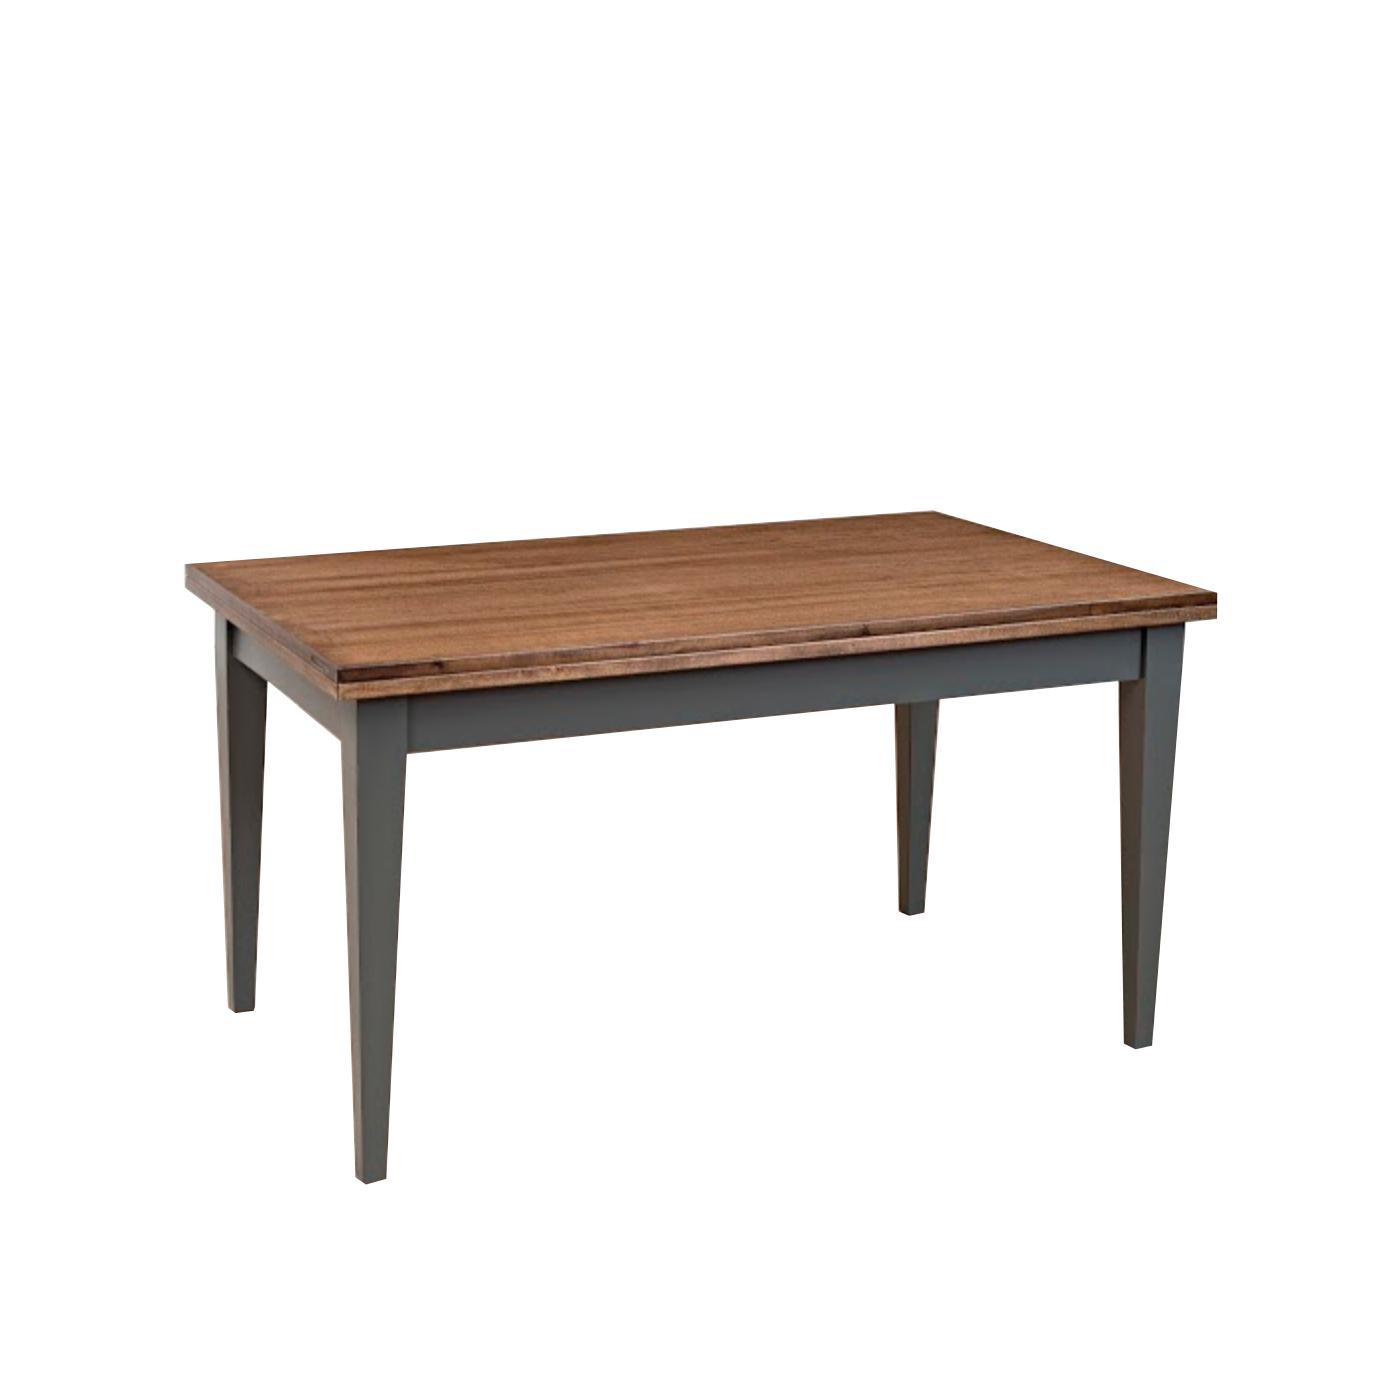 Flip Top Table ( Code 4020) Image